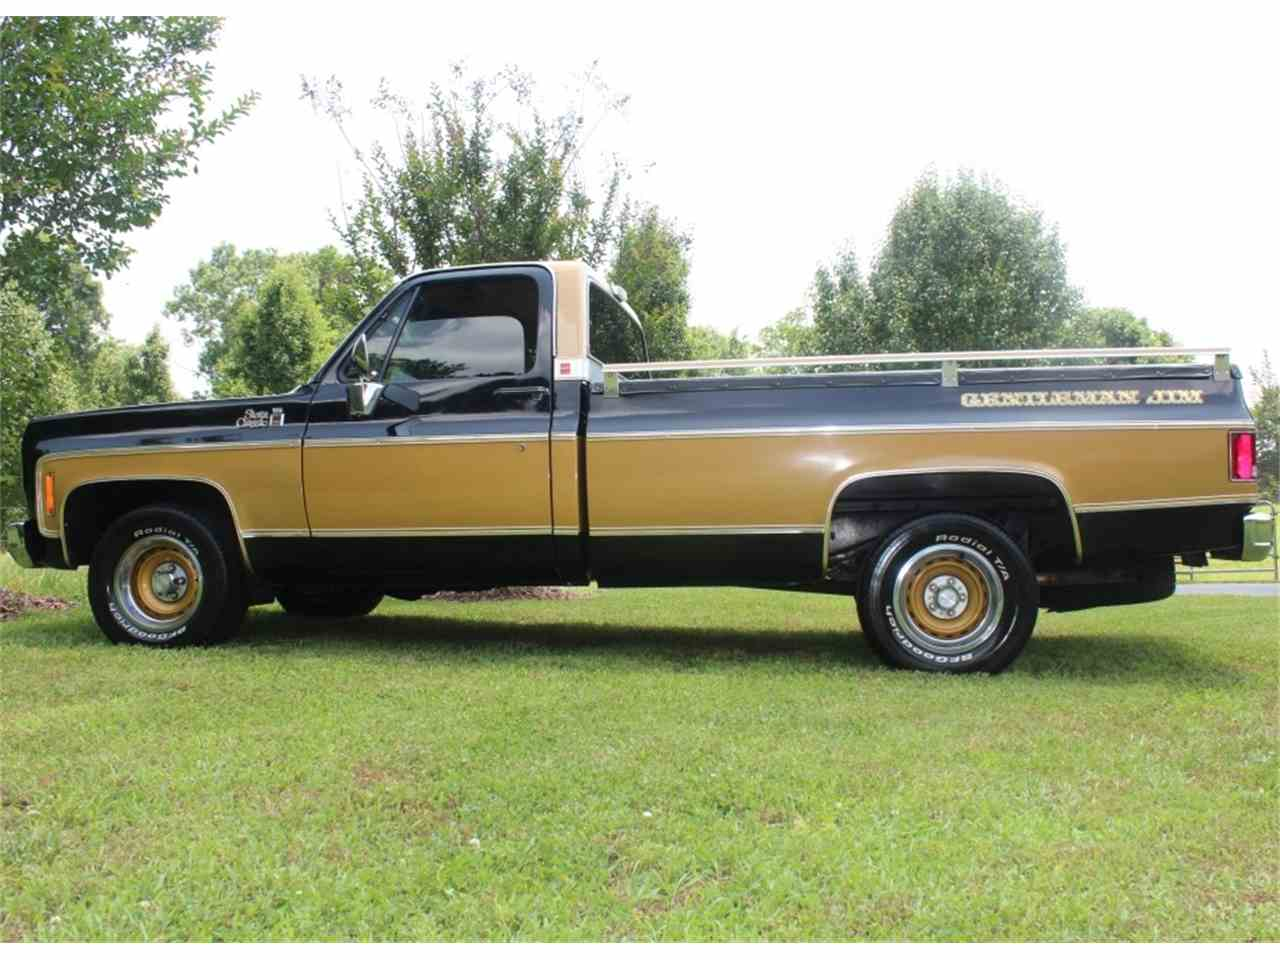 1975 Gmc Pickup For Sale Classiccars Com Cc 578910